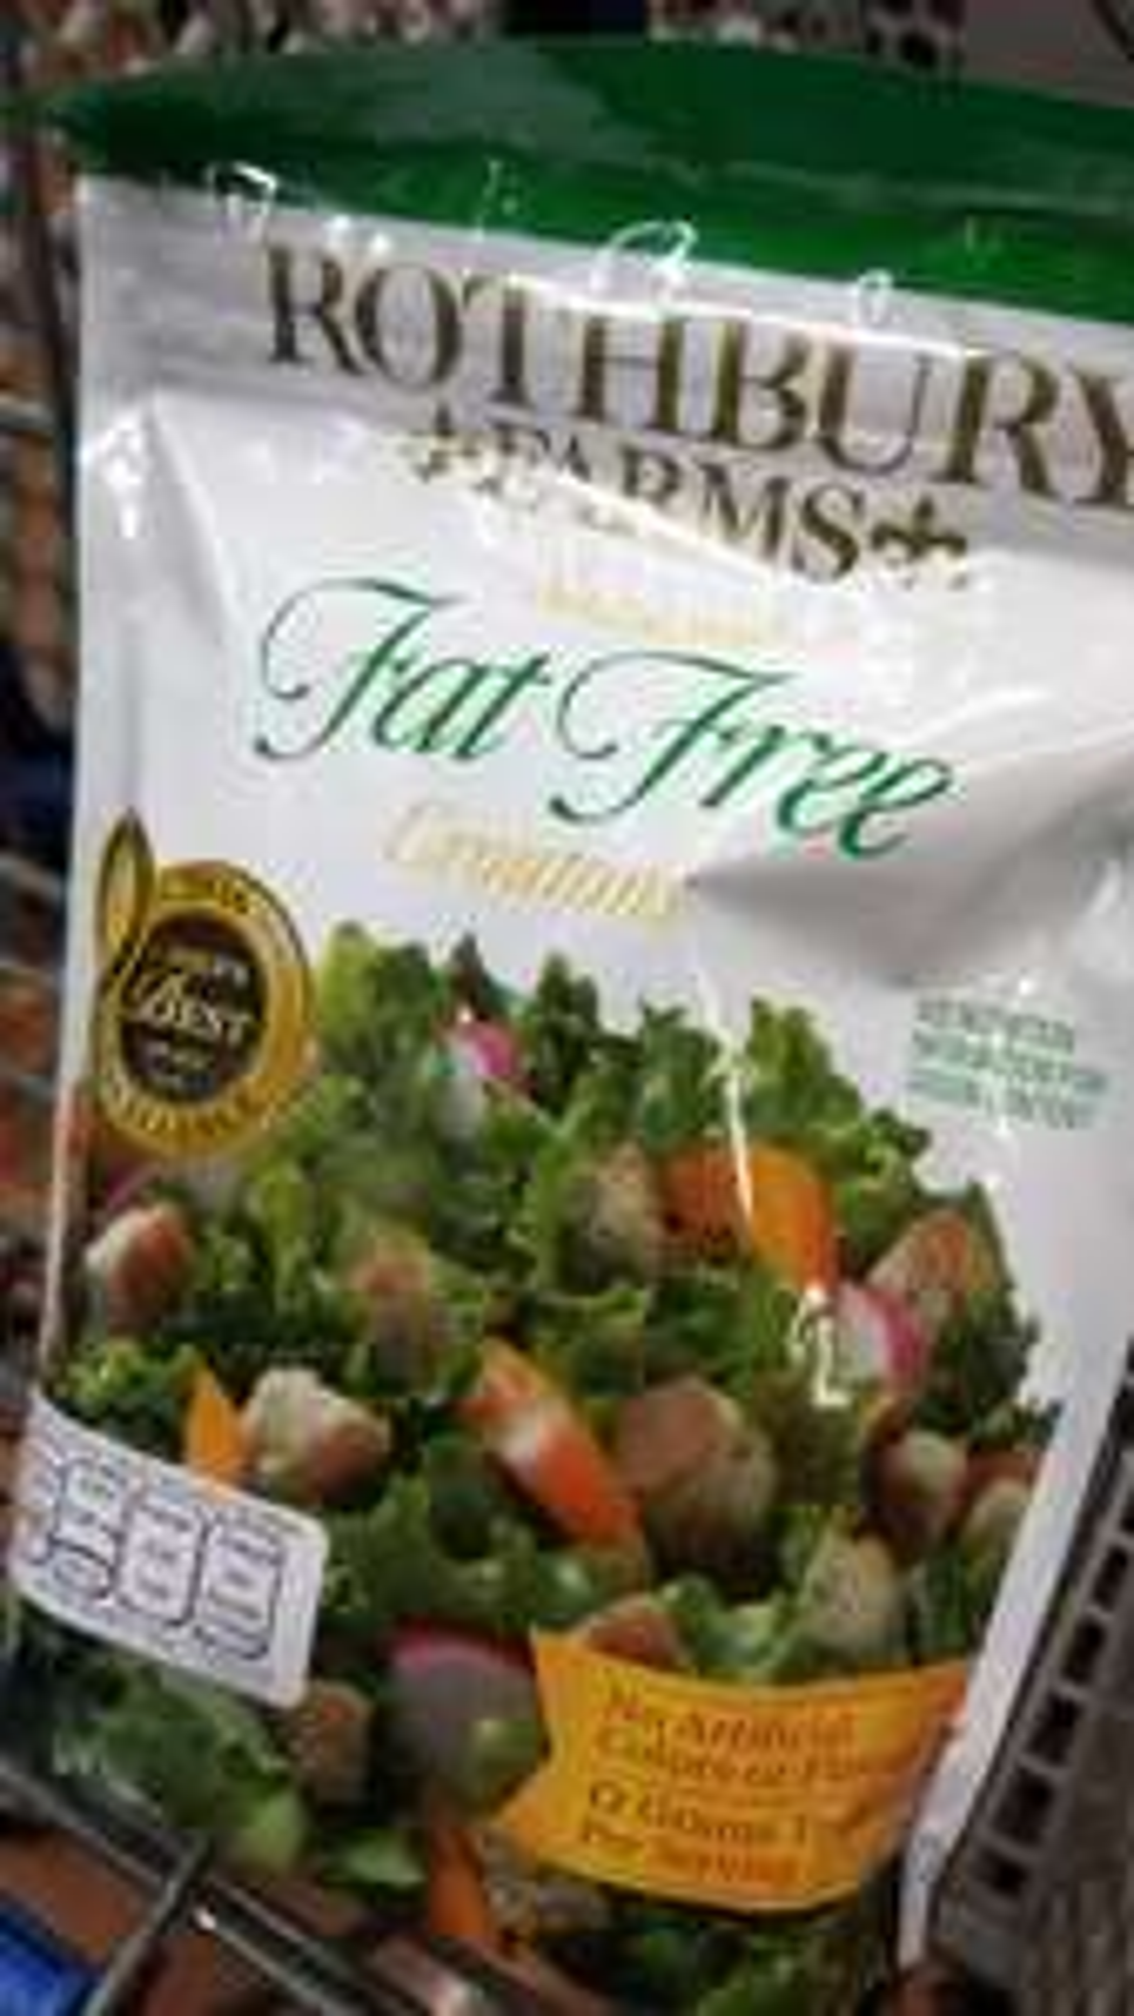 Walmart: Croutones fat free